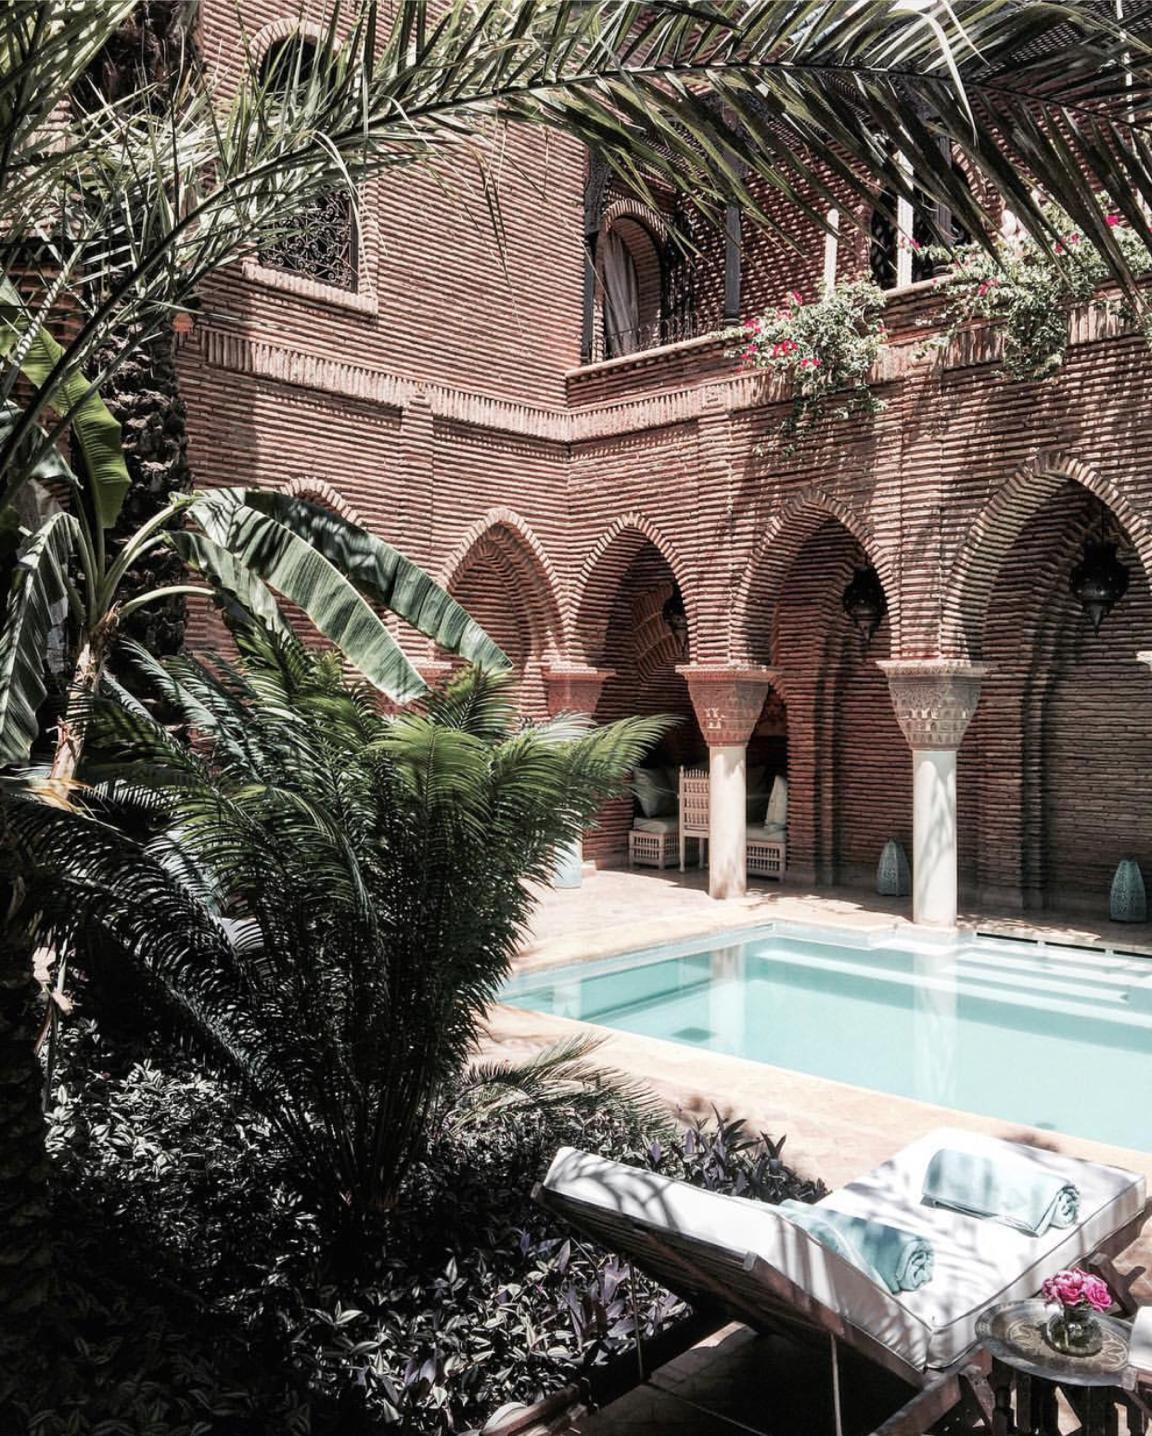 La Sultana Marrakech Kasbah Marrakesh Marrakesh Tensift El Haouz Morocco Mechouar Kasbah Venue Report Marrakech Africa Travel Dutch Gardens